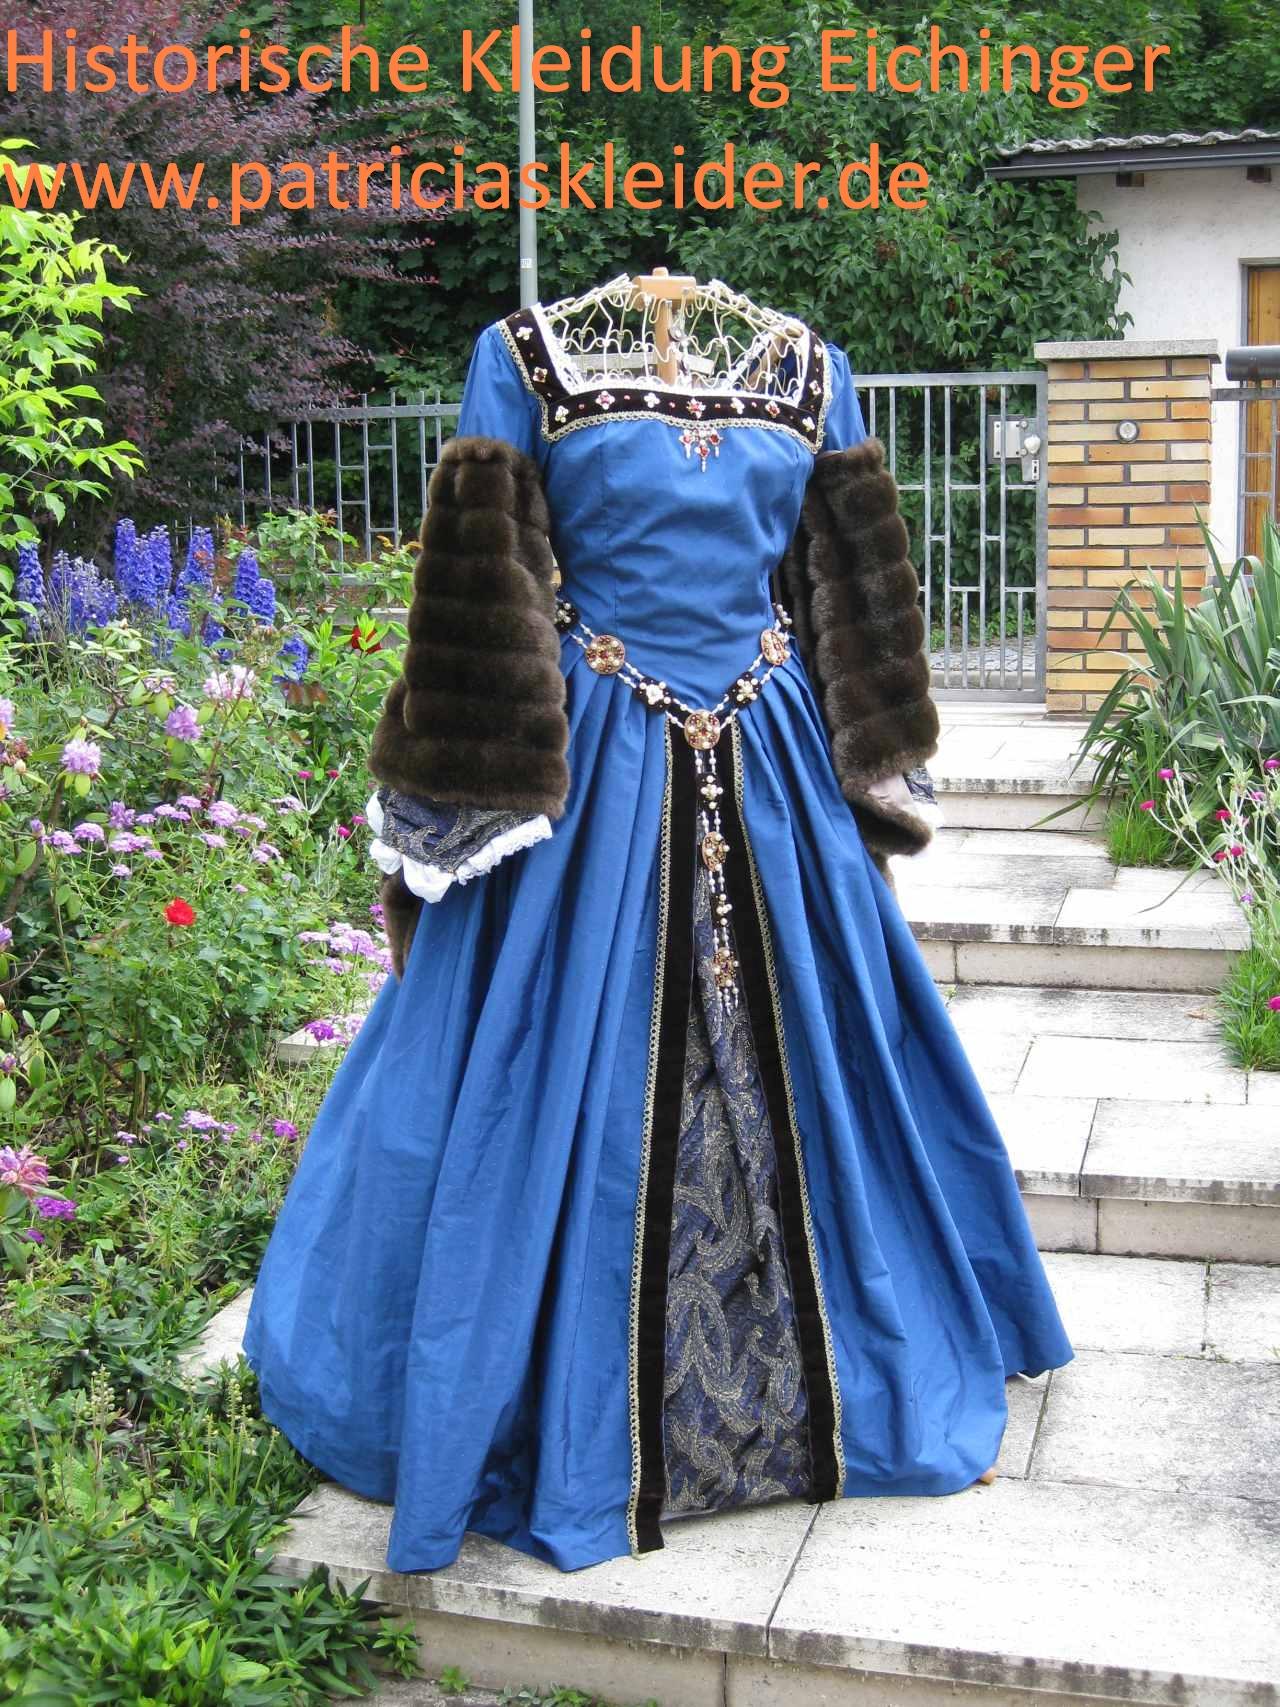 Renaissancekleid - Tudorkleid England um1530